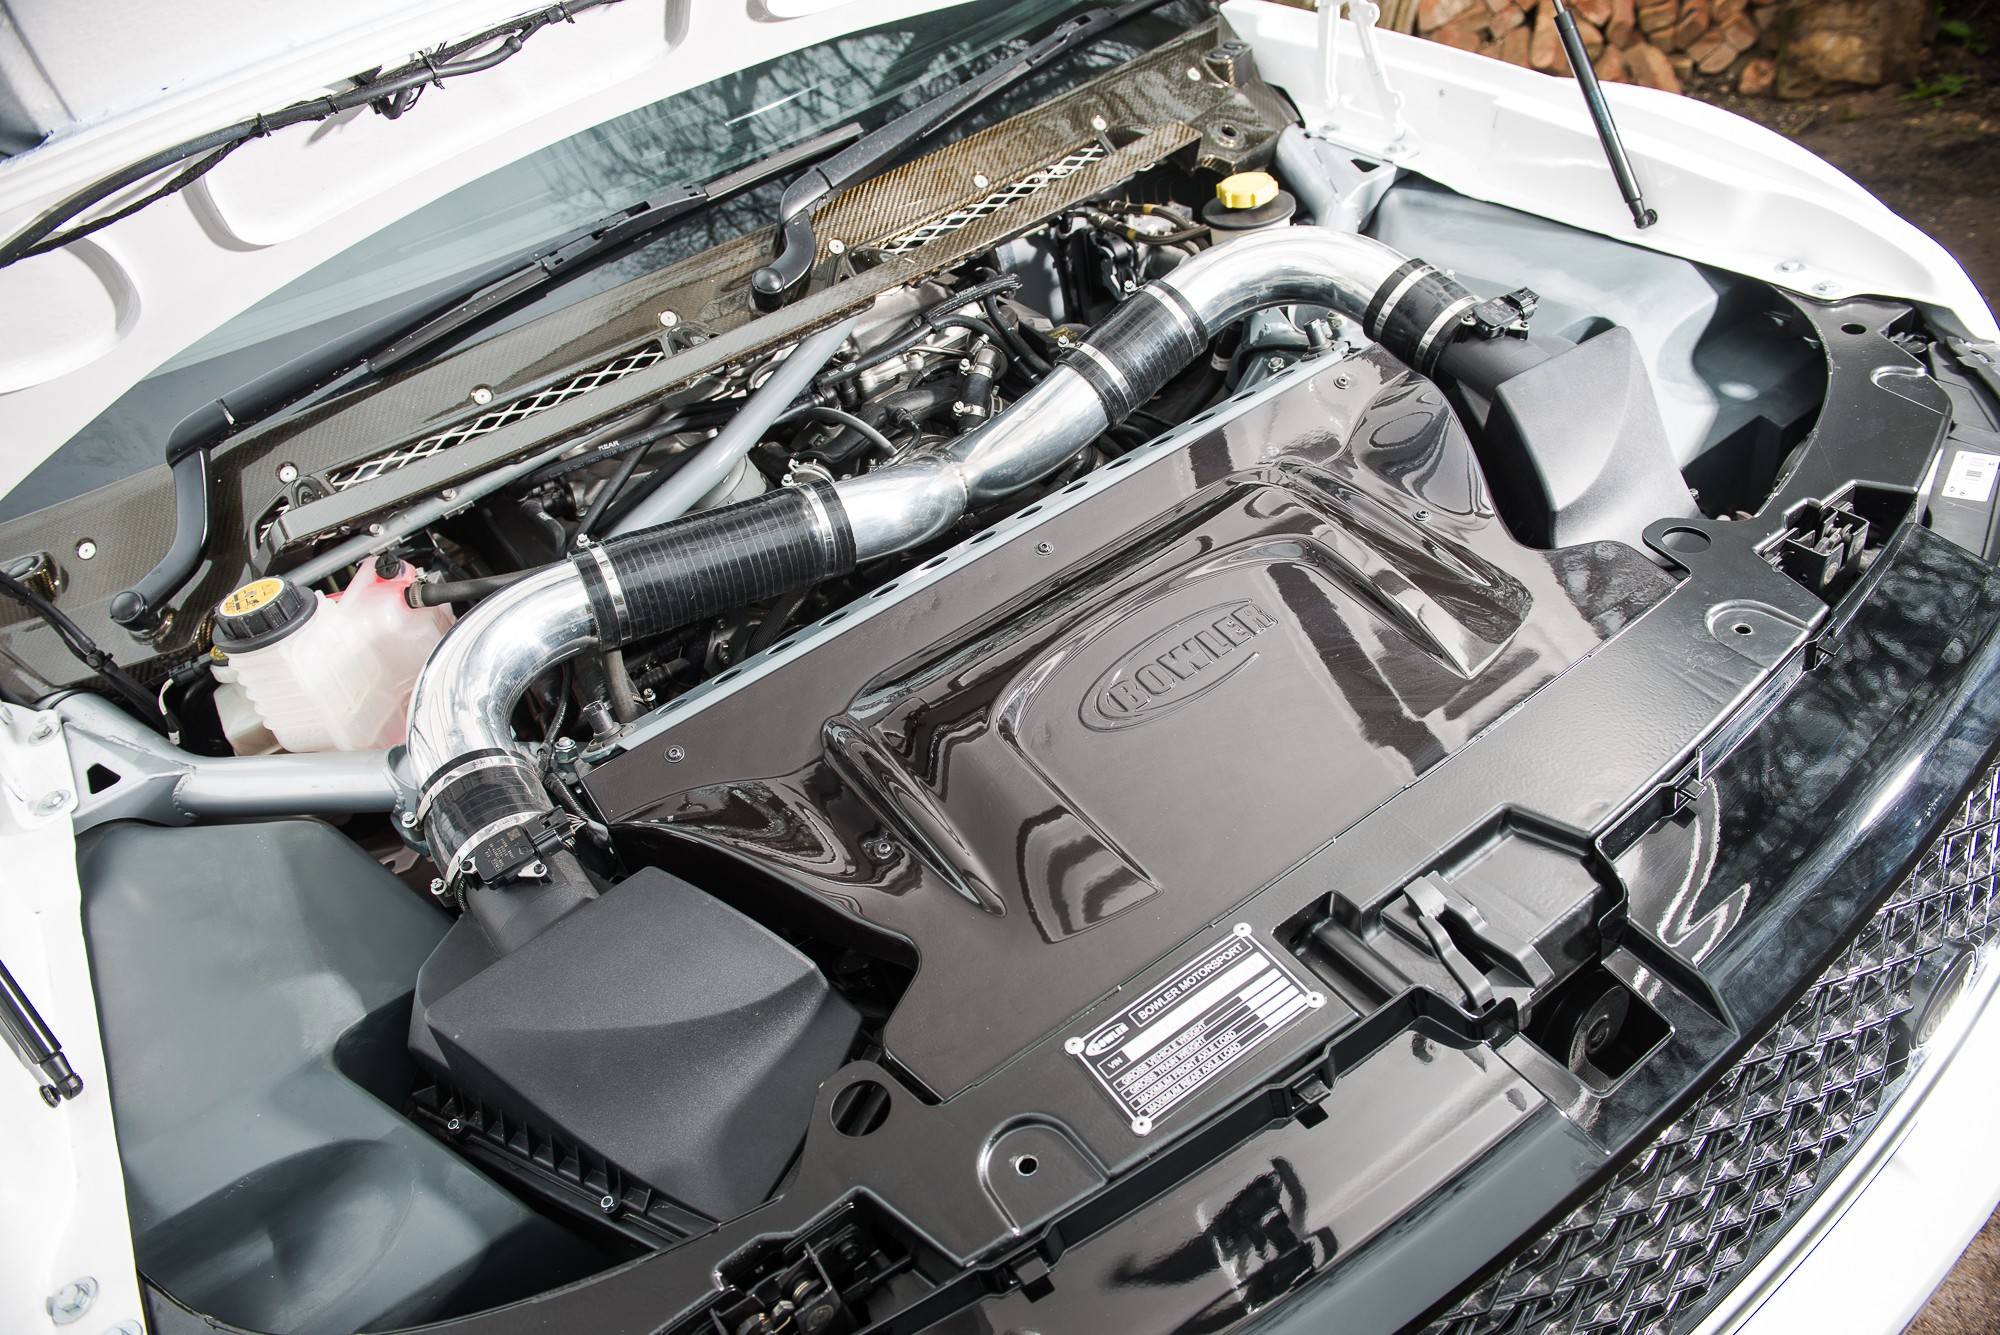 Low Mileage Bowler EXR-S for Sale at Auction - autoevolution